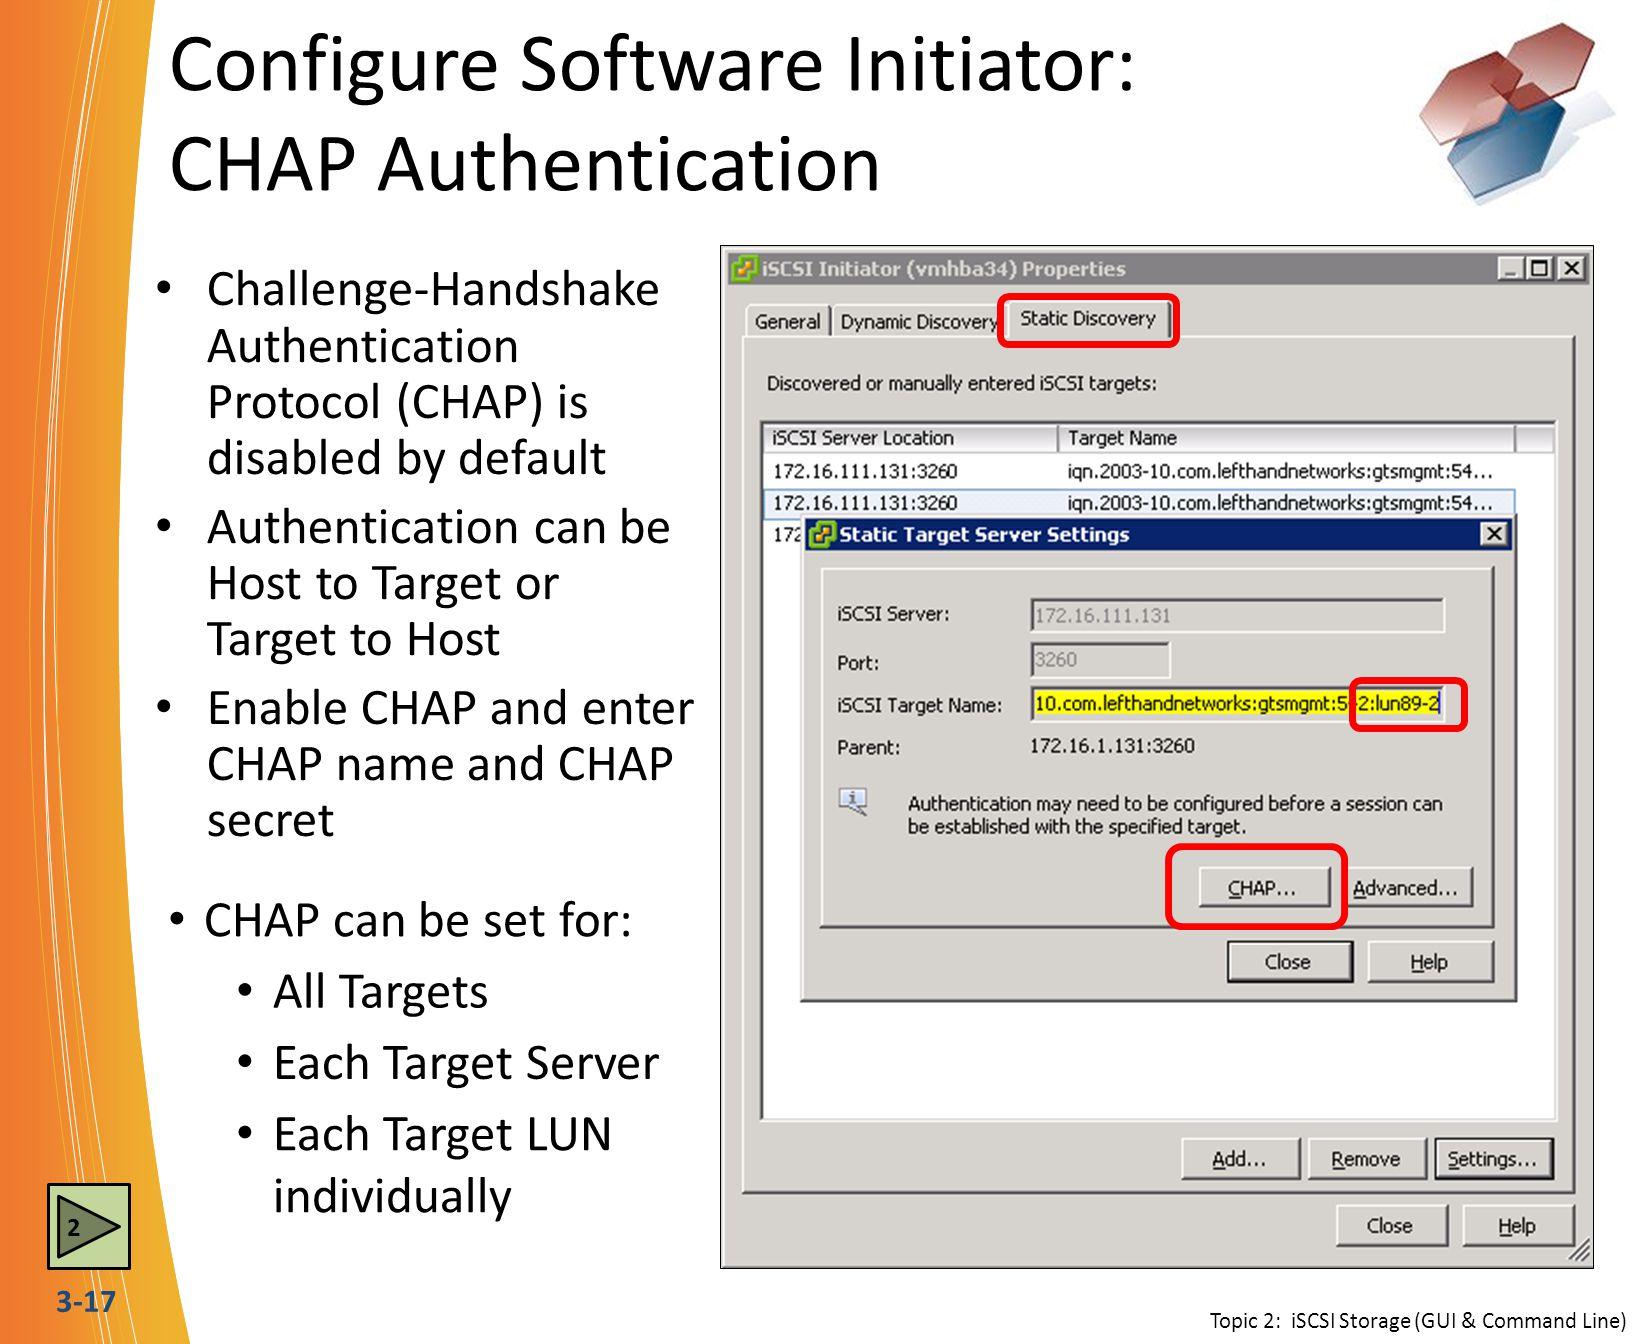 3-17 Configure Software Initiator: CHAP Authentication Topic 2: iSCSI Storage (GUI & Command Line) Challenge-Handshake Authentication Protocol (CHAP)